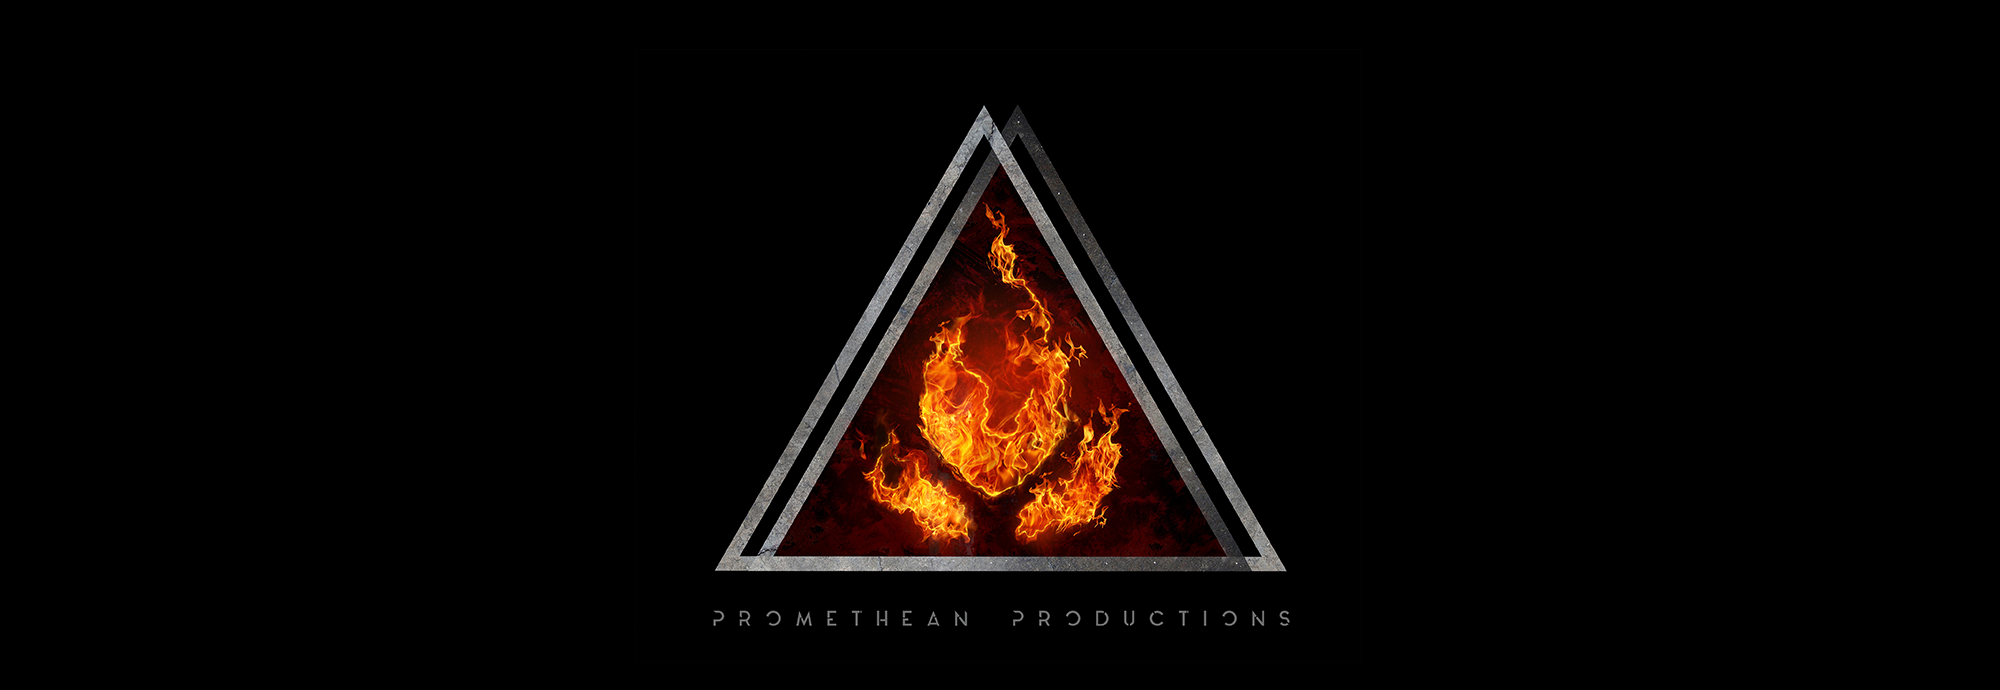 promethean-temp home_F